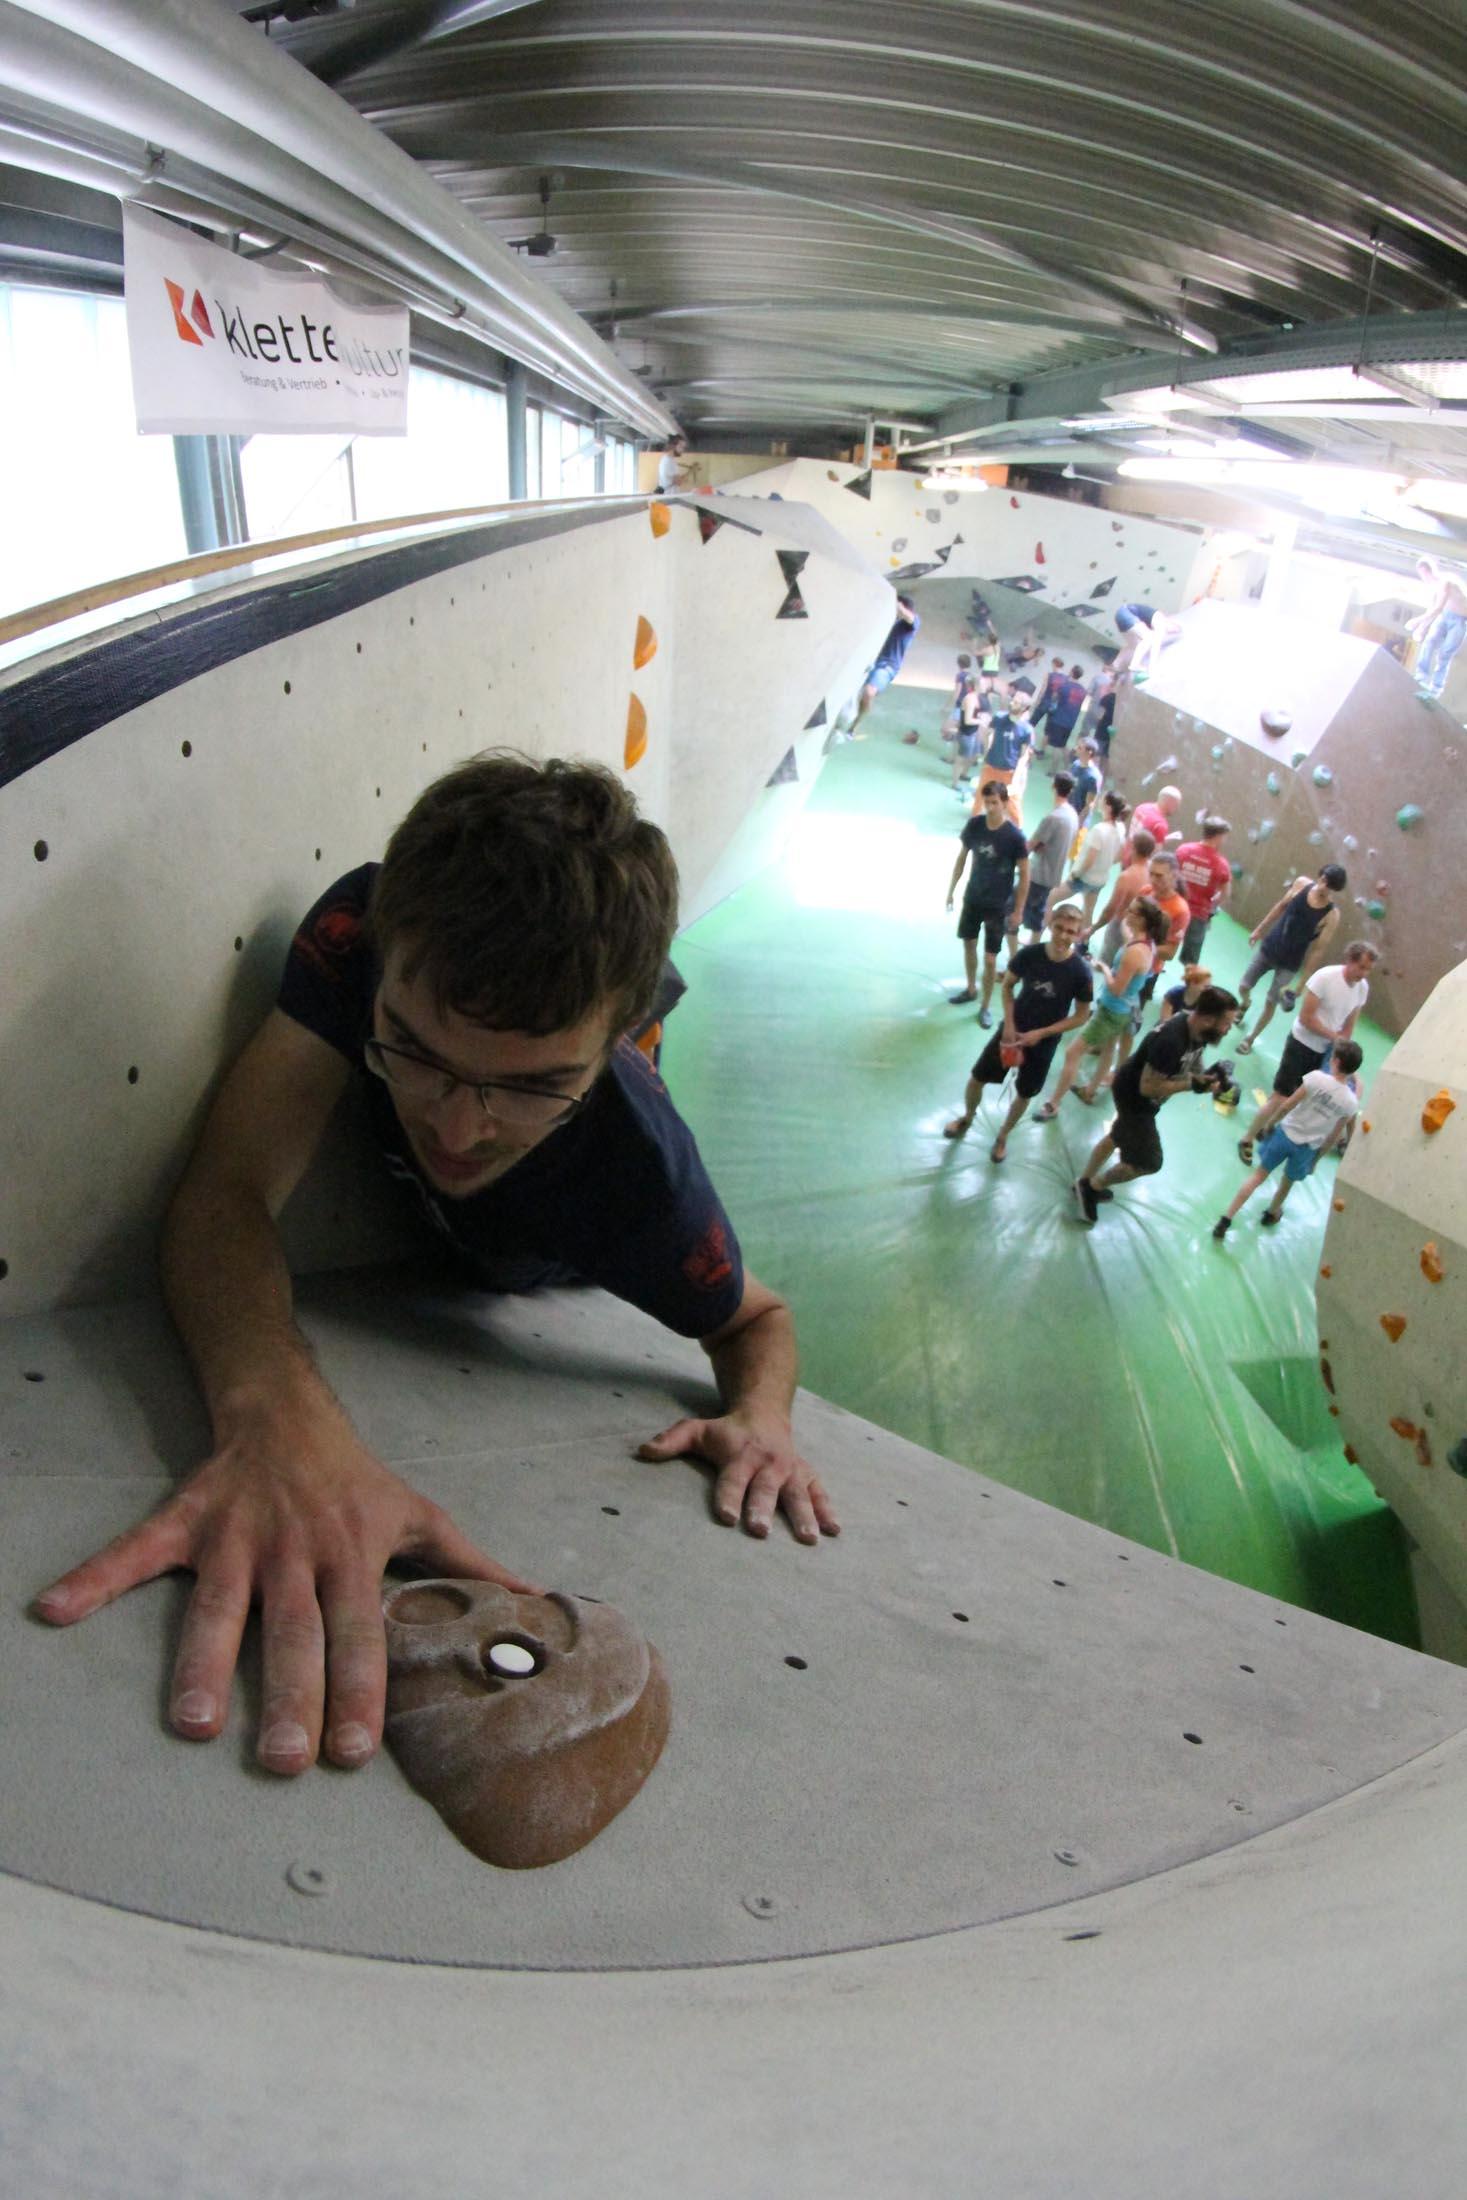 Quali, internationaler bouldercup Frankenjura 2016, BLOCKHELDEN Erlangen, Mammut, Bergfreunde.de, Boulderwettkampf07092016162